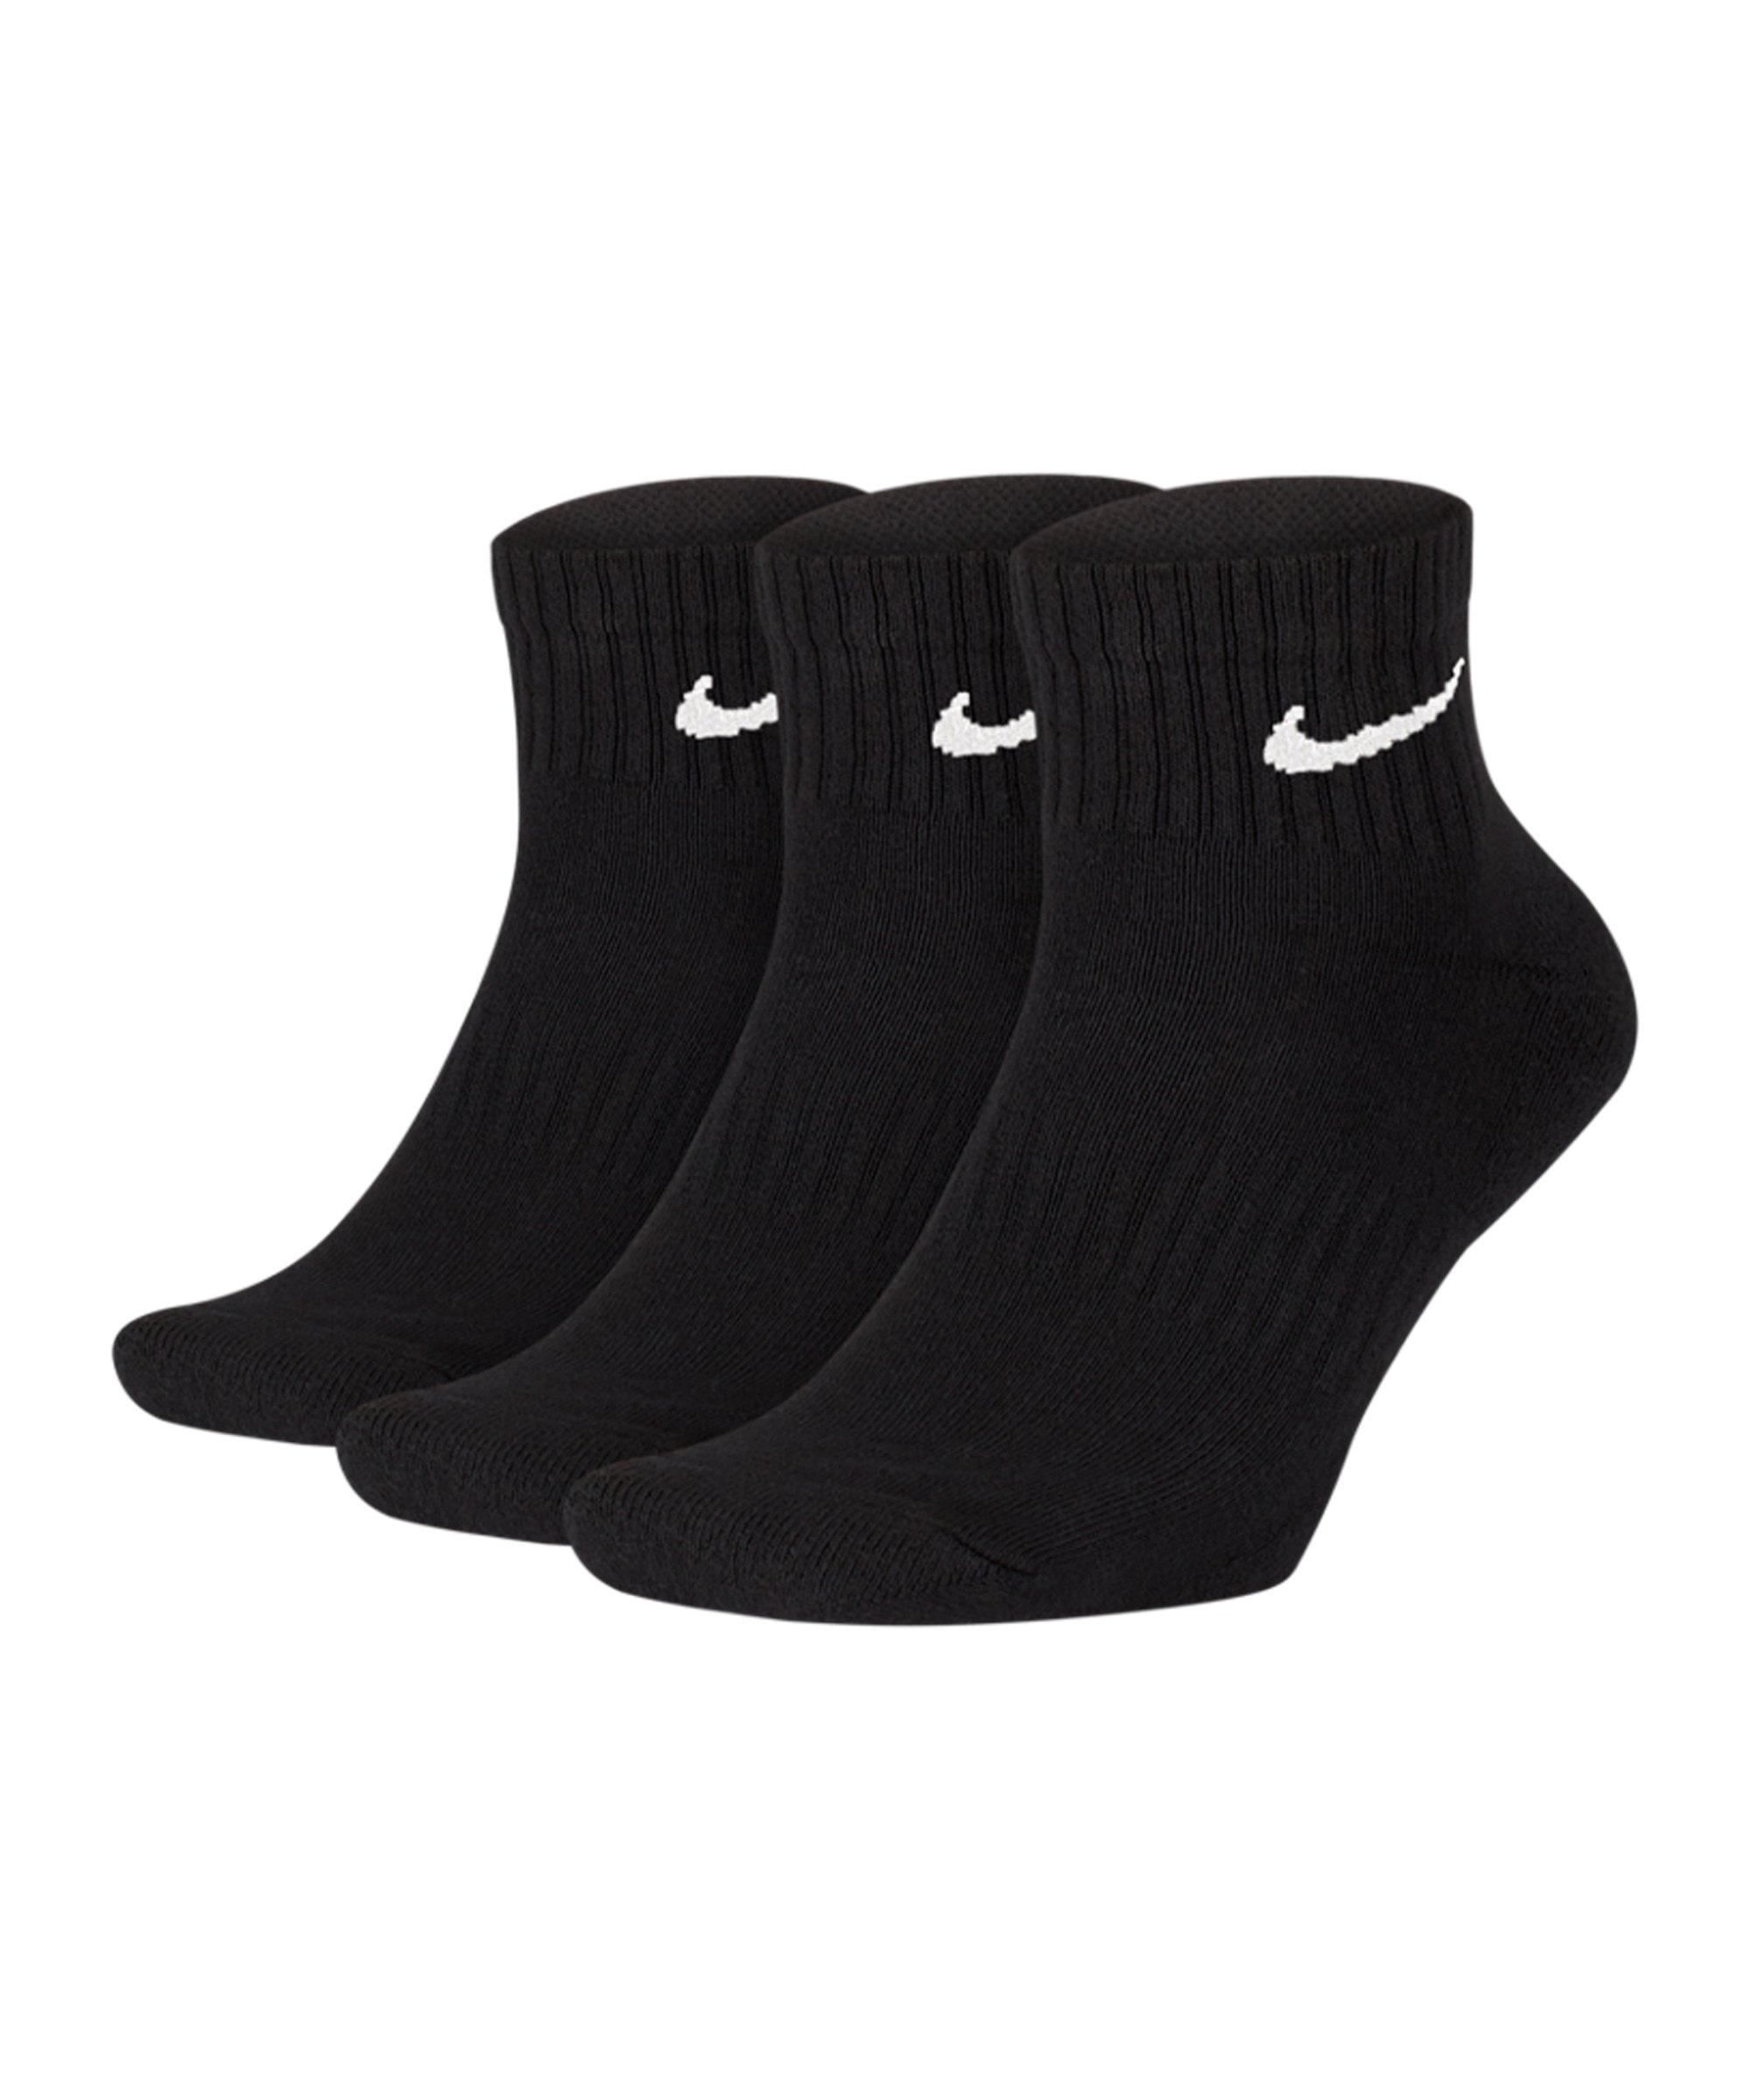 Nike Everyday Cushion Crew 3er Pack Socken F010 - schwarz